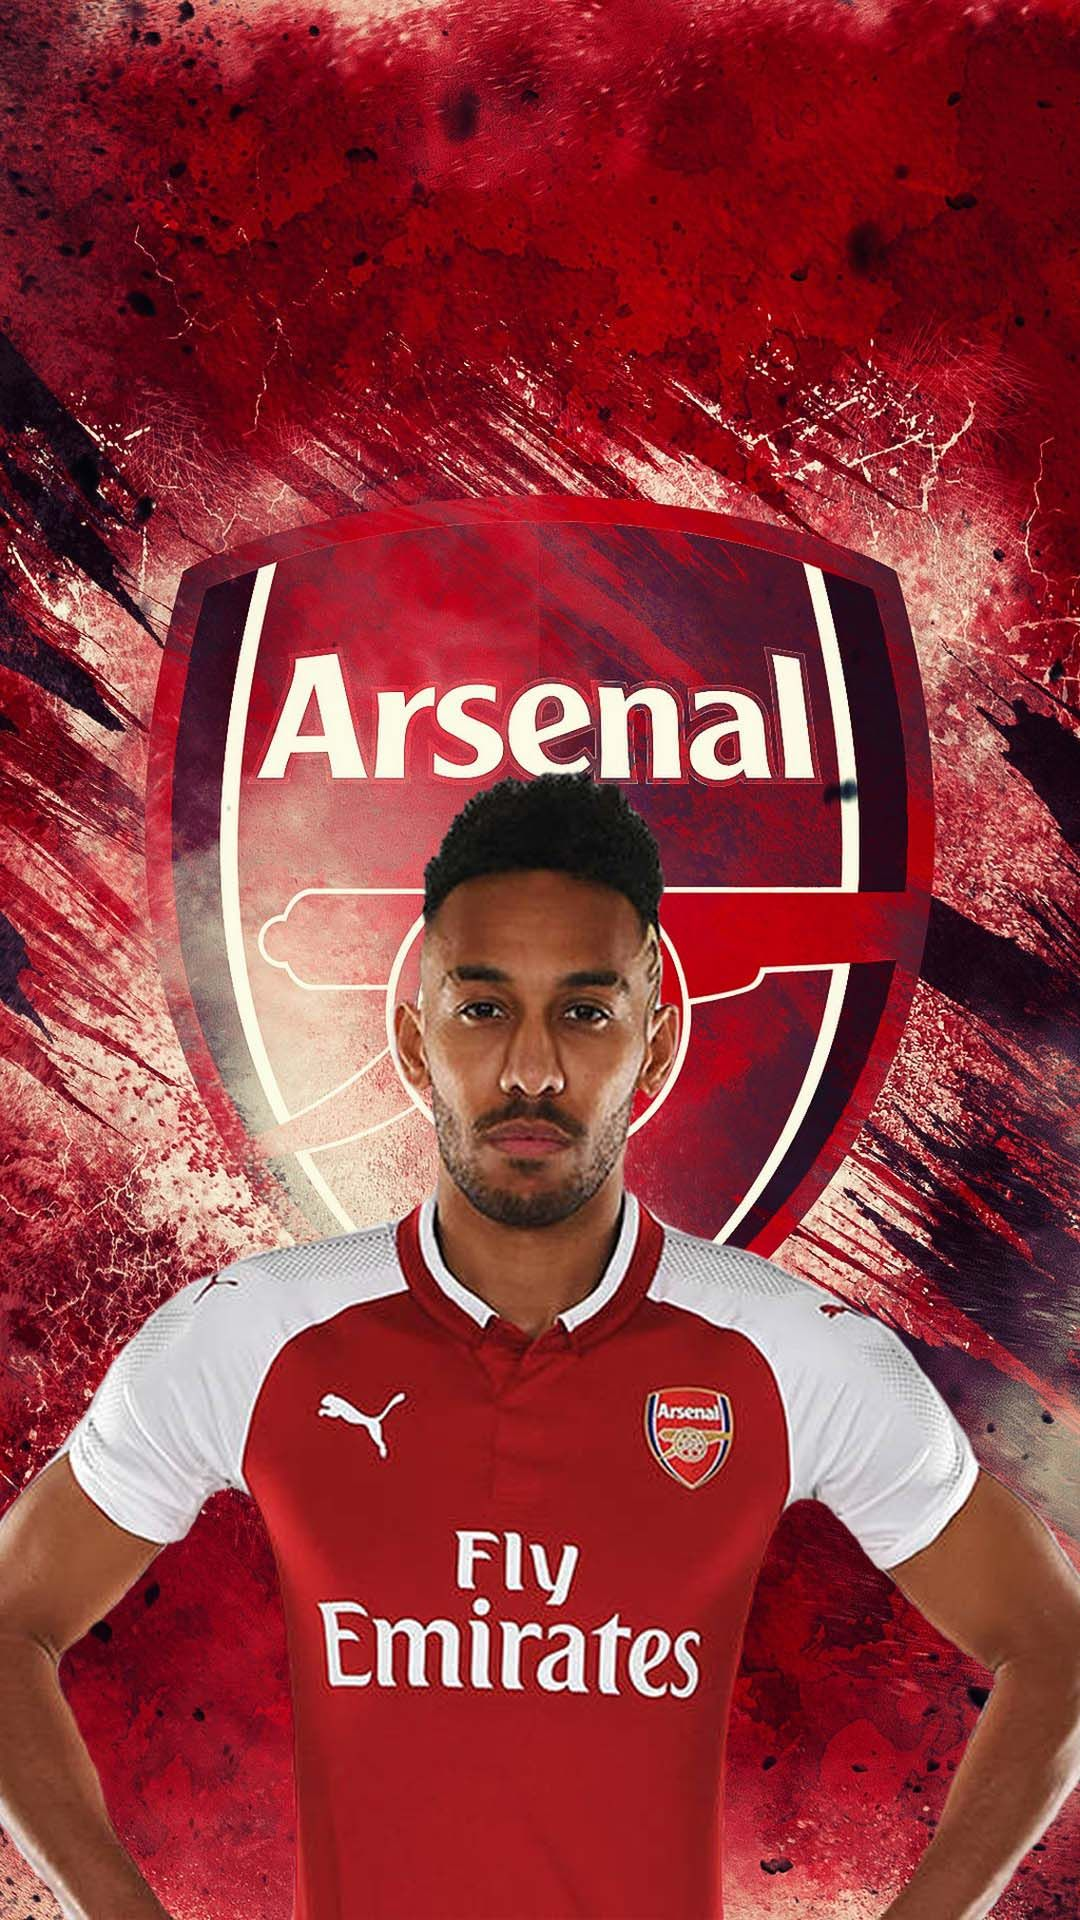 Pierre Emerick Aubameyang Arsenal iPhone Wallpaper Futbolcular 1080x1920